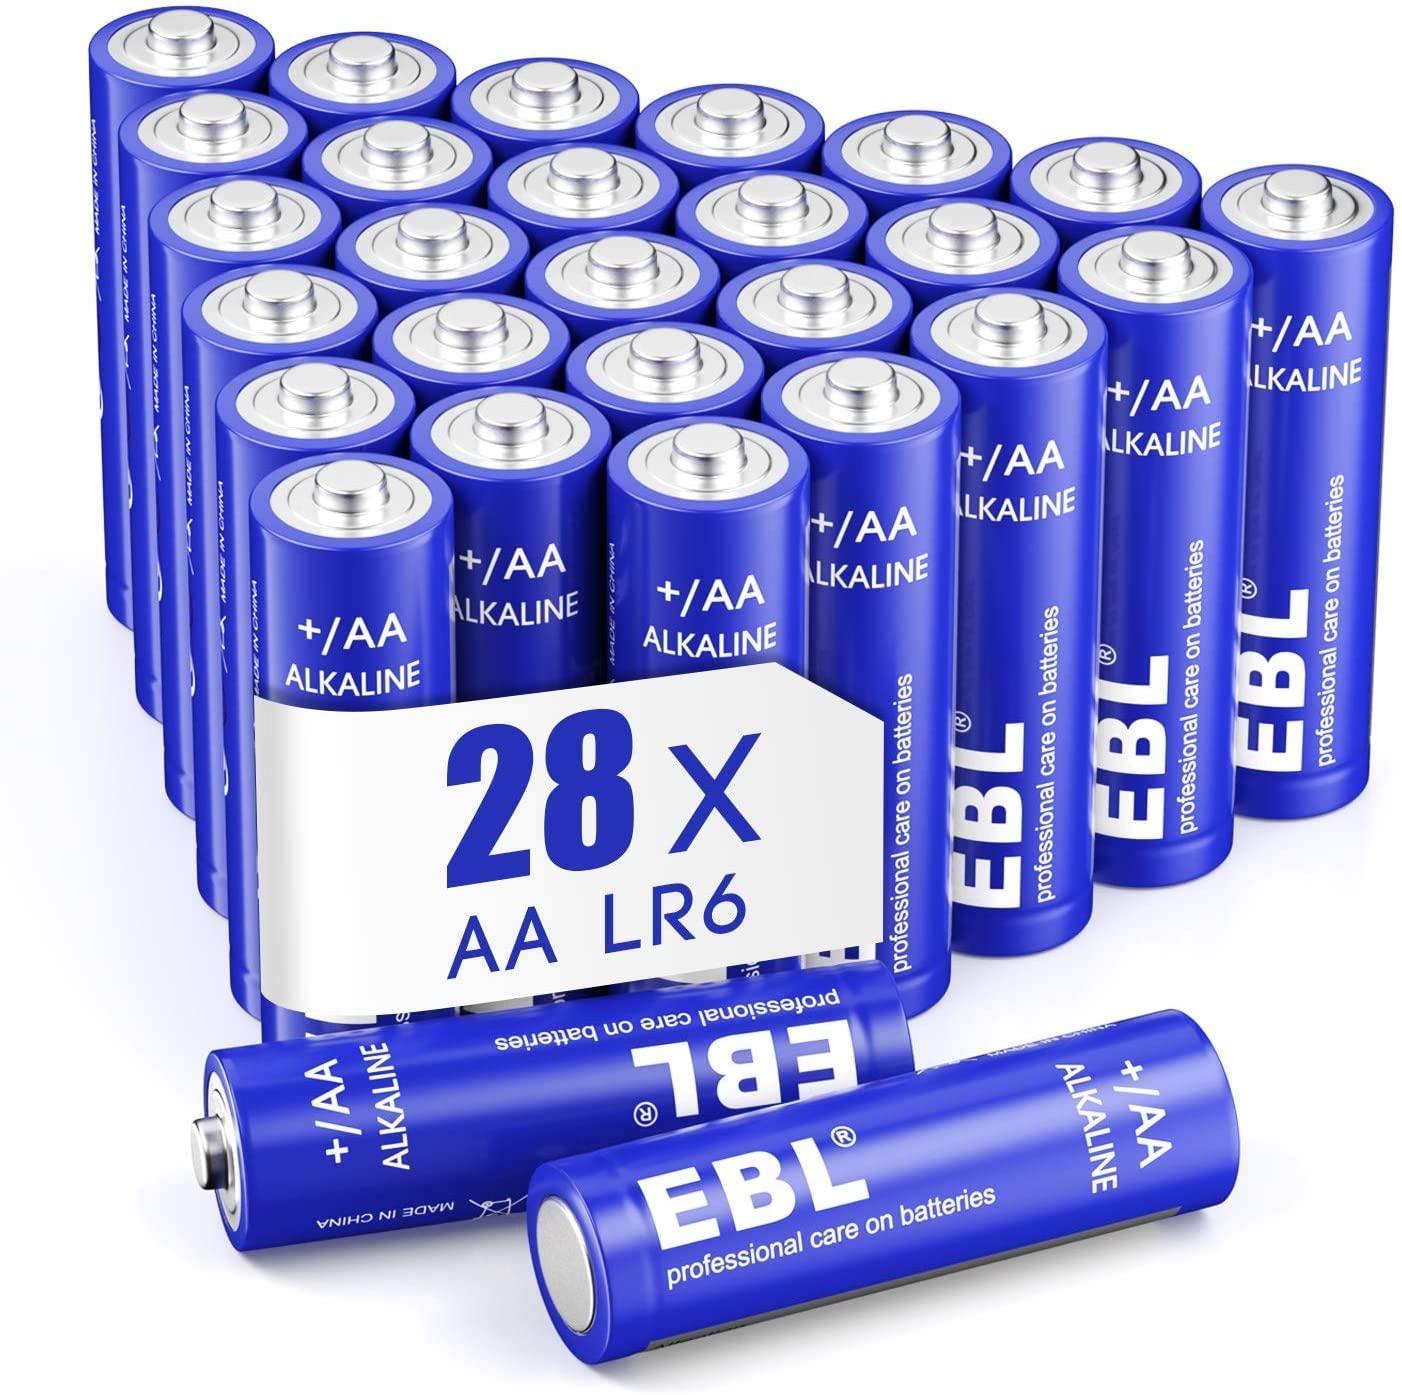 EBL AA Batteries 1.5V AA Alkaline Everyday AA Battery Batteries - Pack of 28 (£4.70 Very Good/£4.95 Like New) + £4.49 NP @ Amazon Warehouse